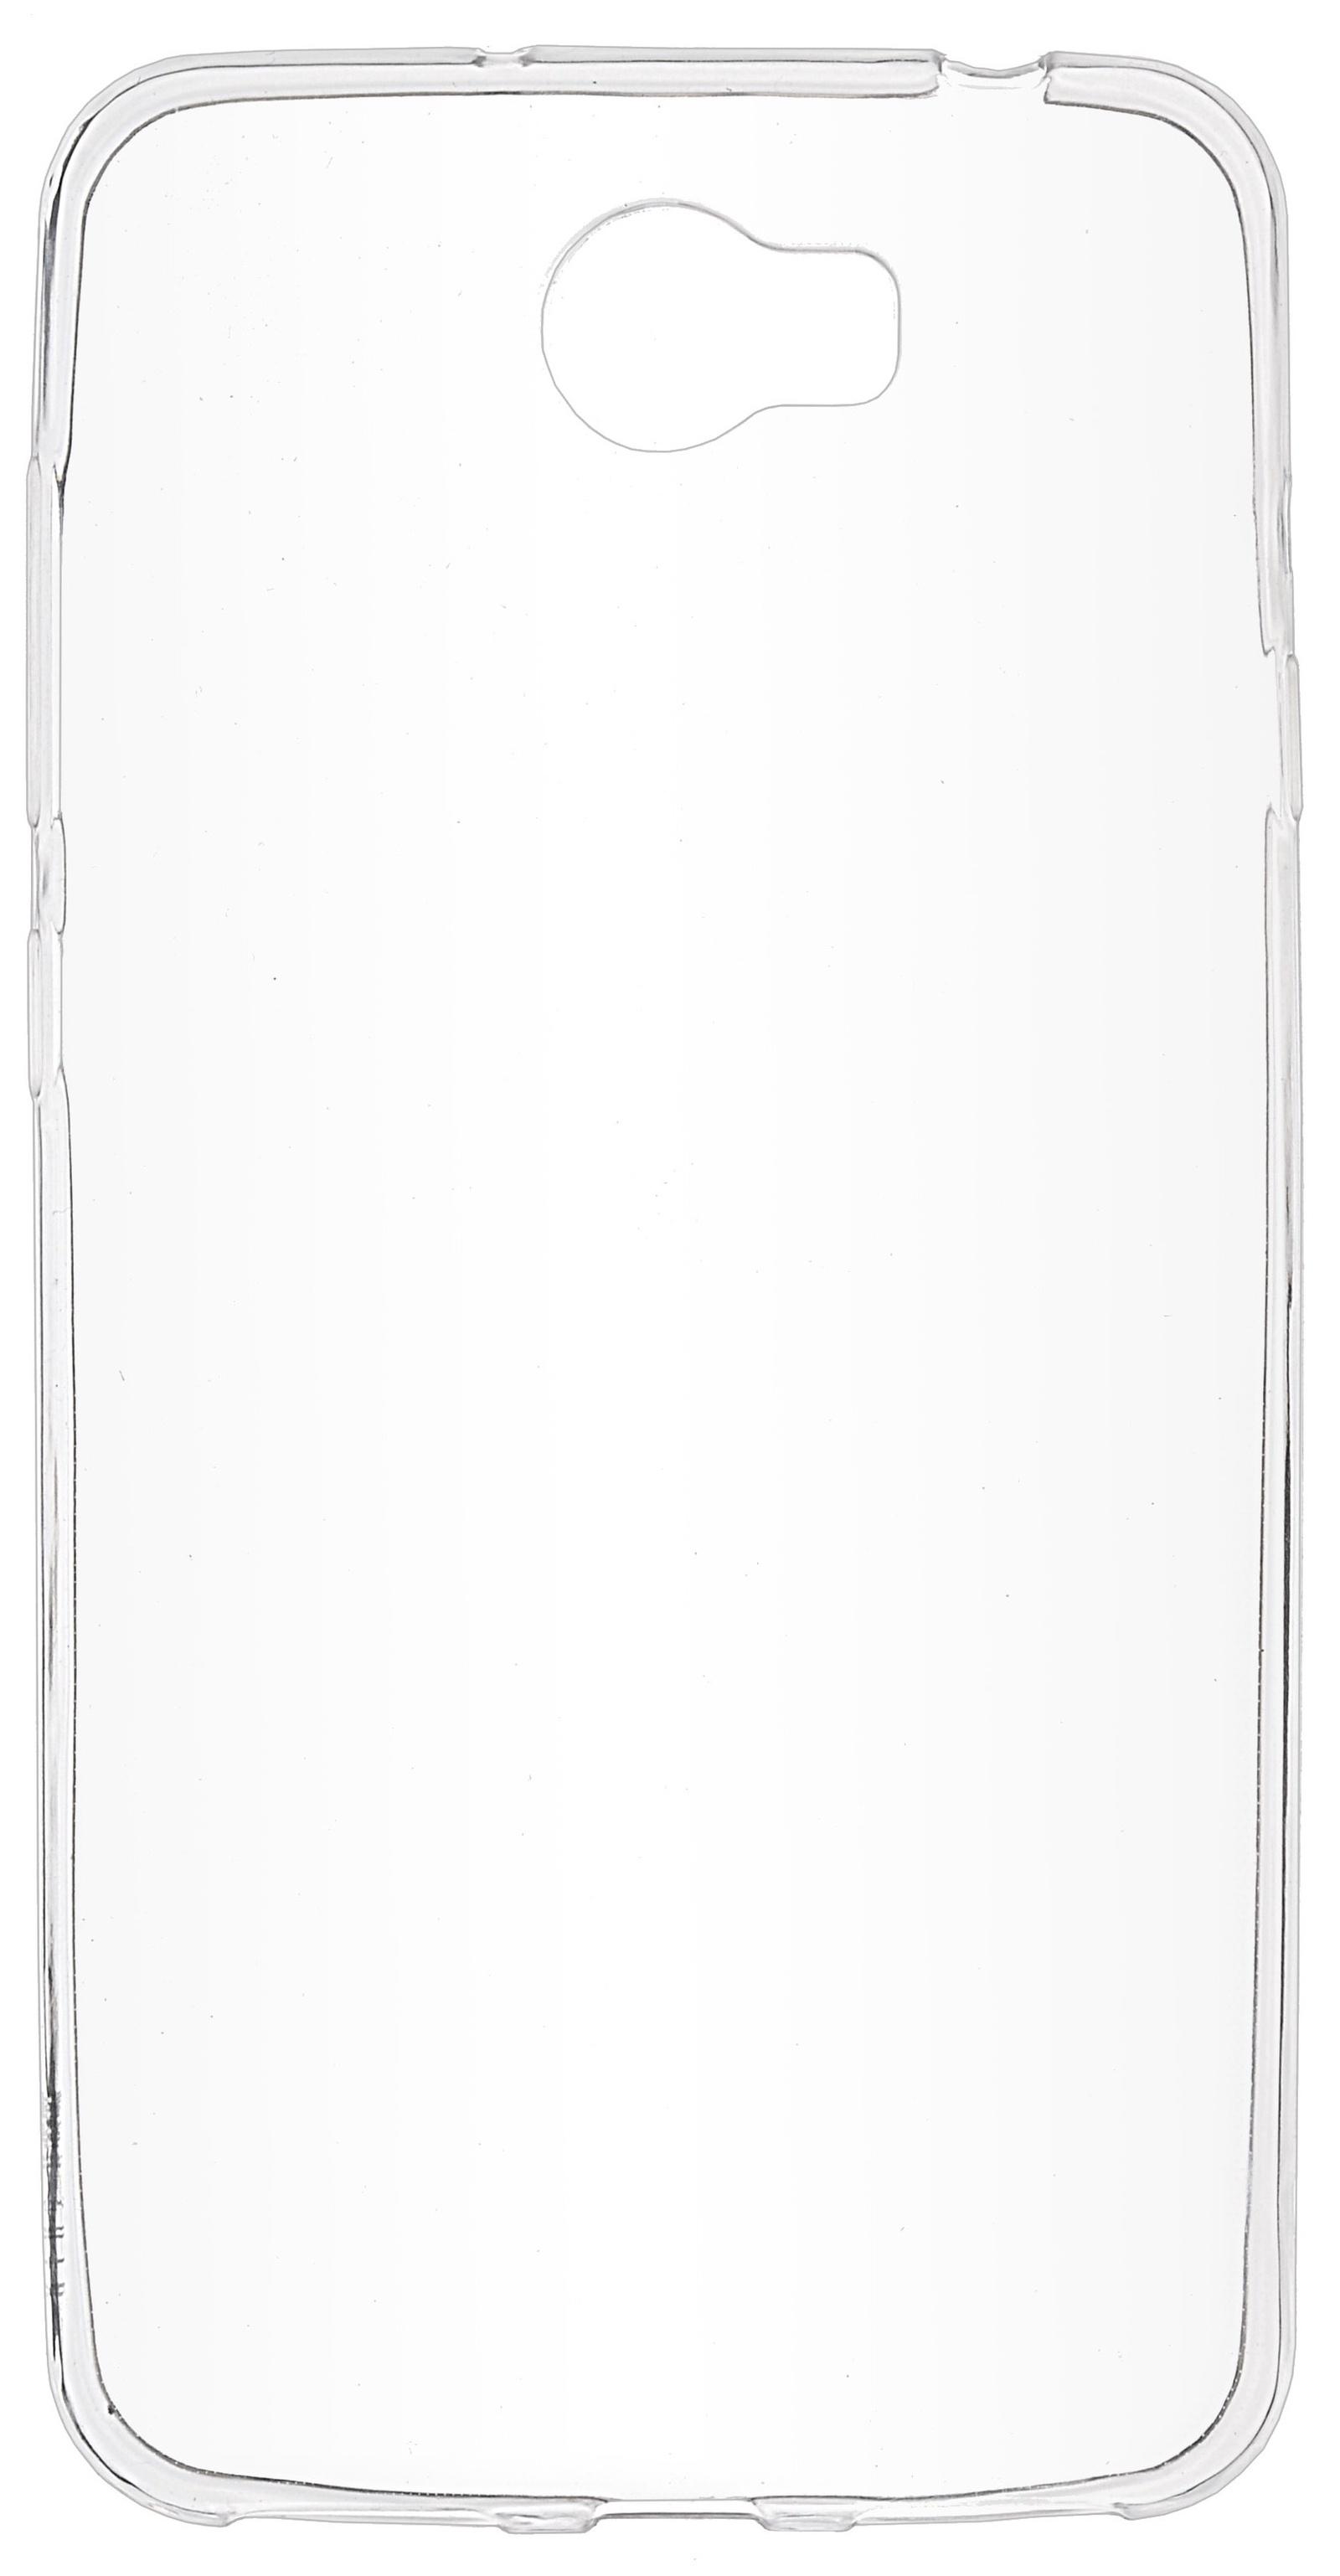 Чехол для сотового телефона skinBOX Slim Silicone, 4660041407778, прозрачный цена и фото